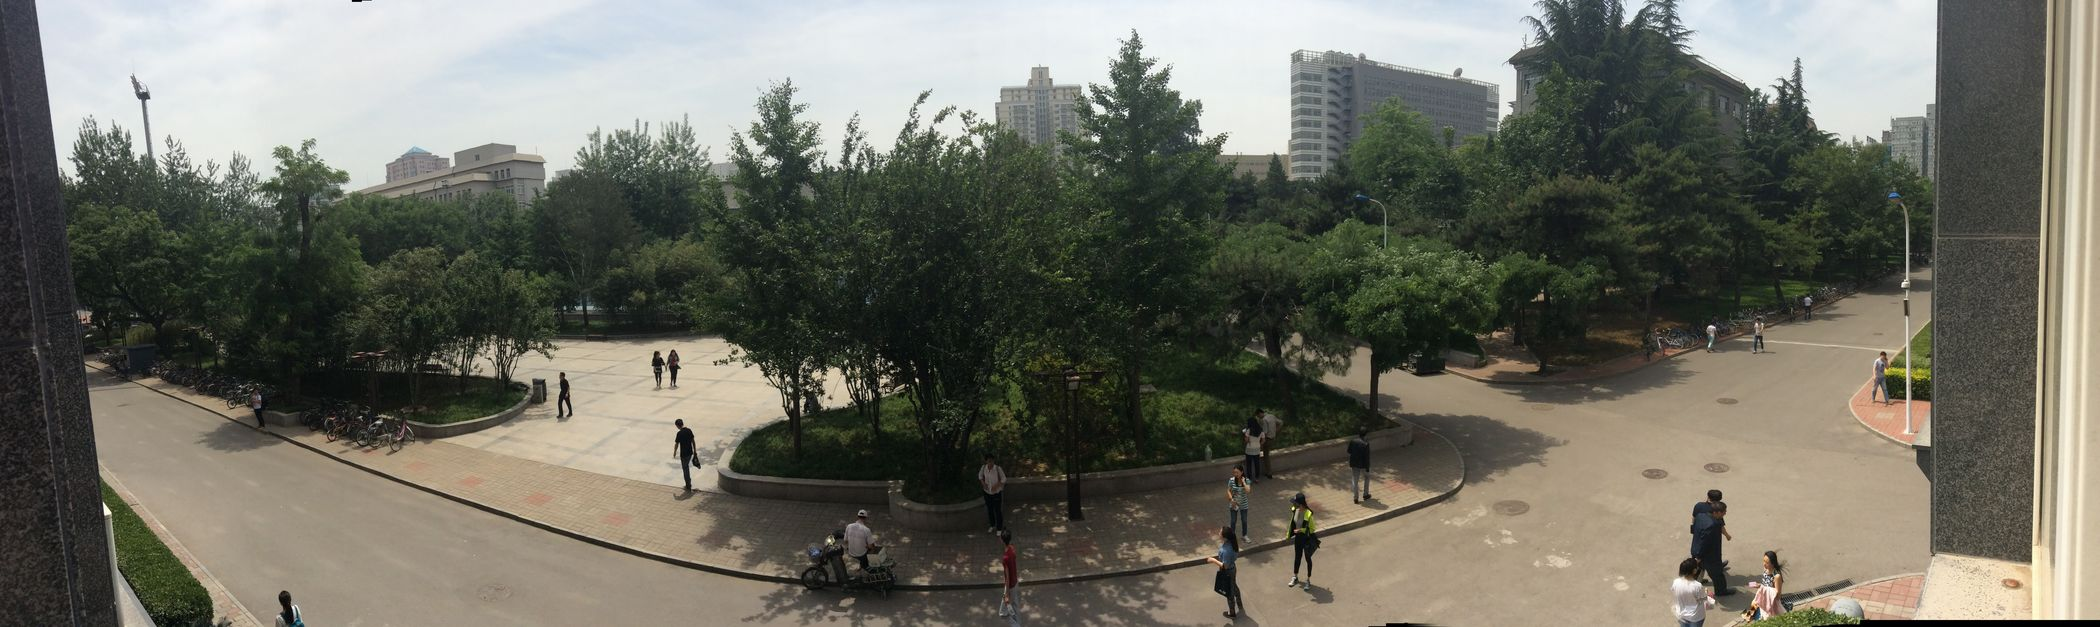 In The Terminal Asian Culture RobertEkbergTallberg Secret Garden Landscape 北京